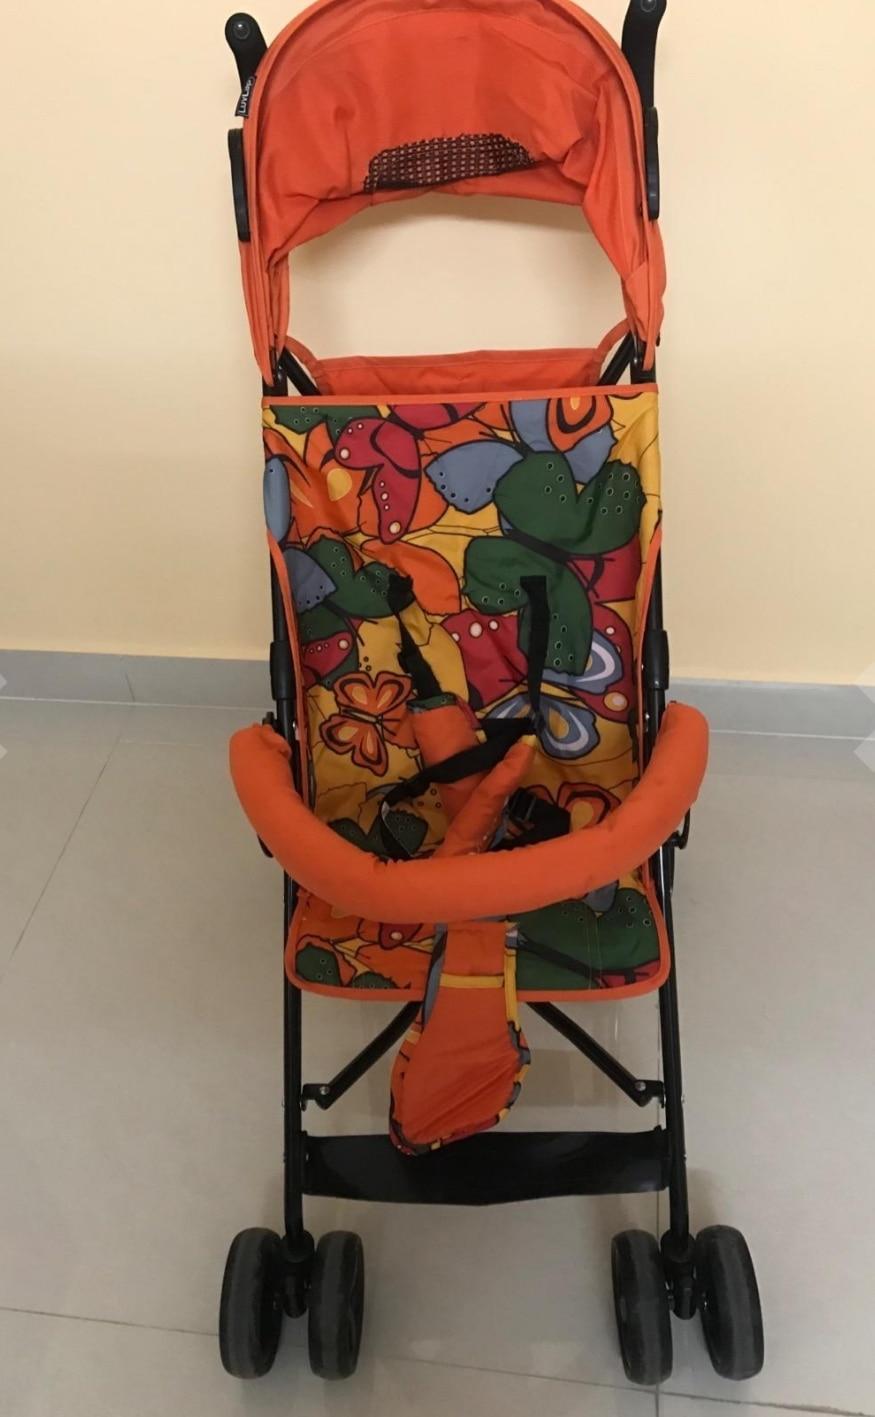 LuvLap Joy Baby Stroller - MomJunction